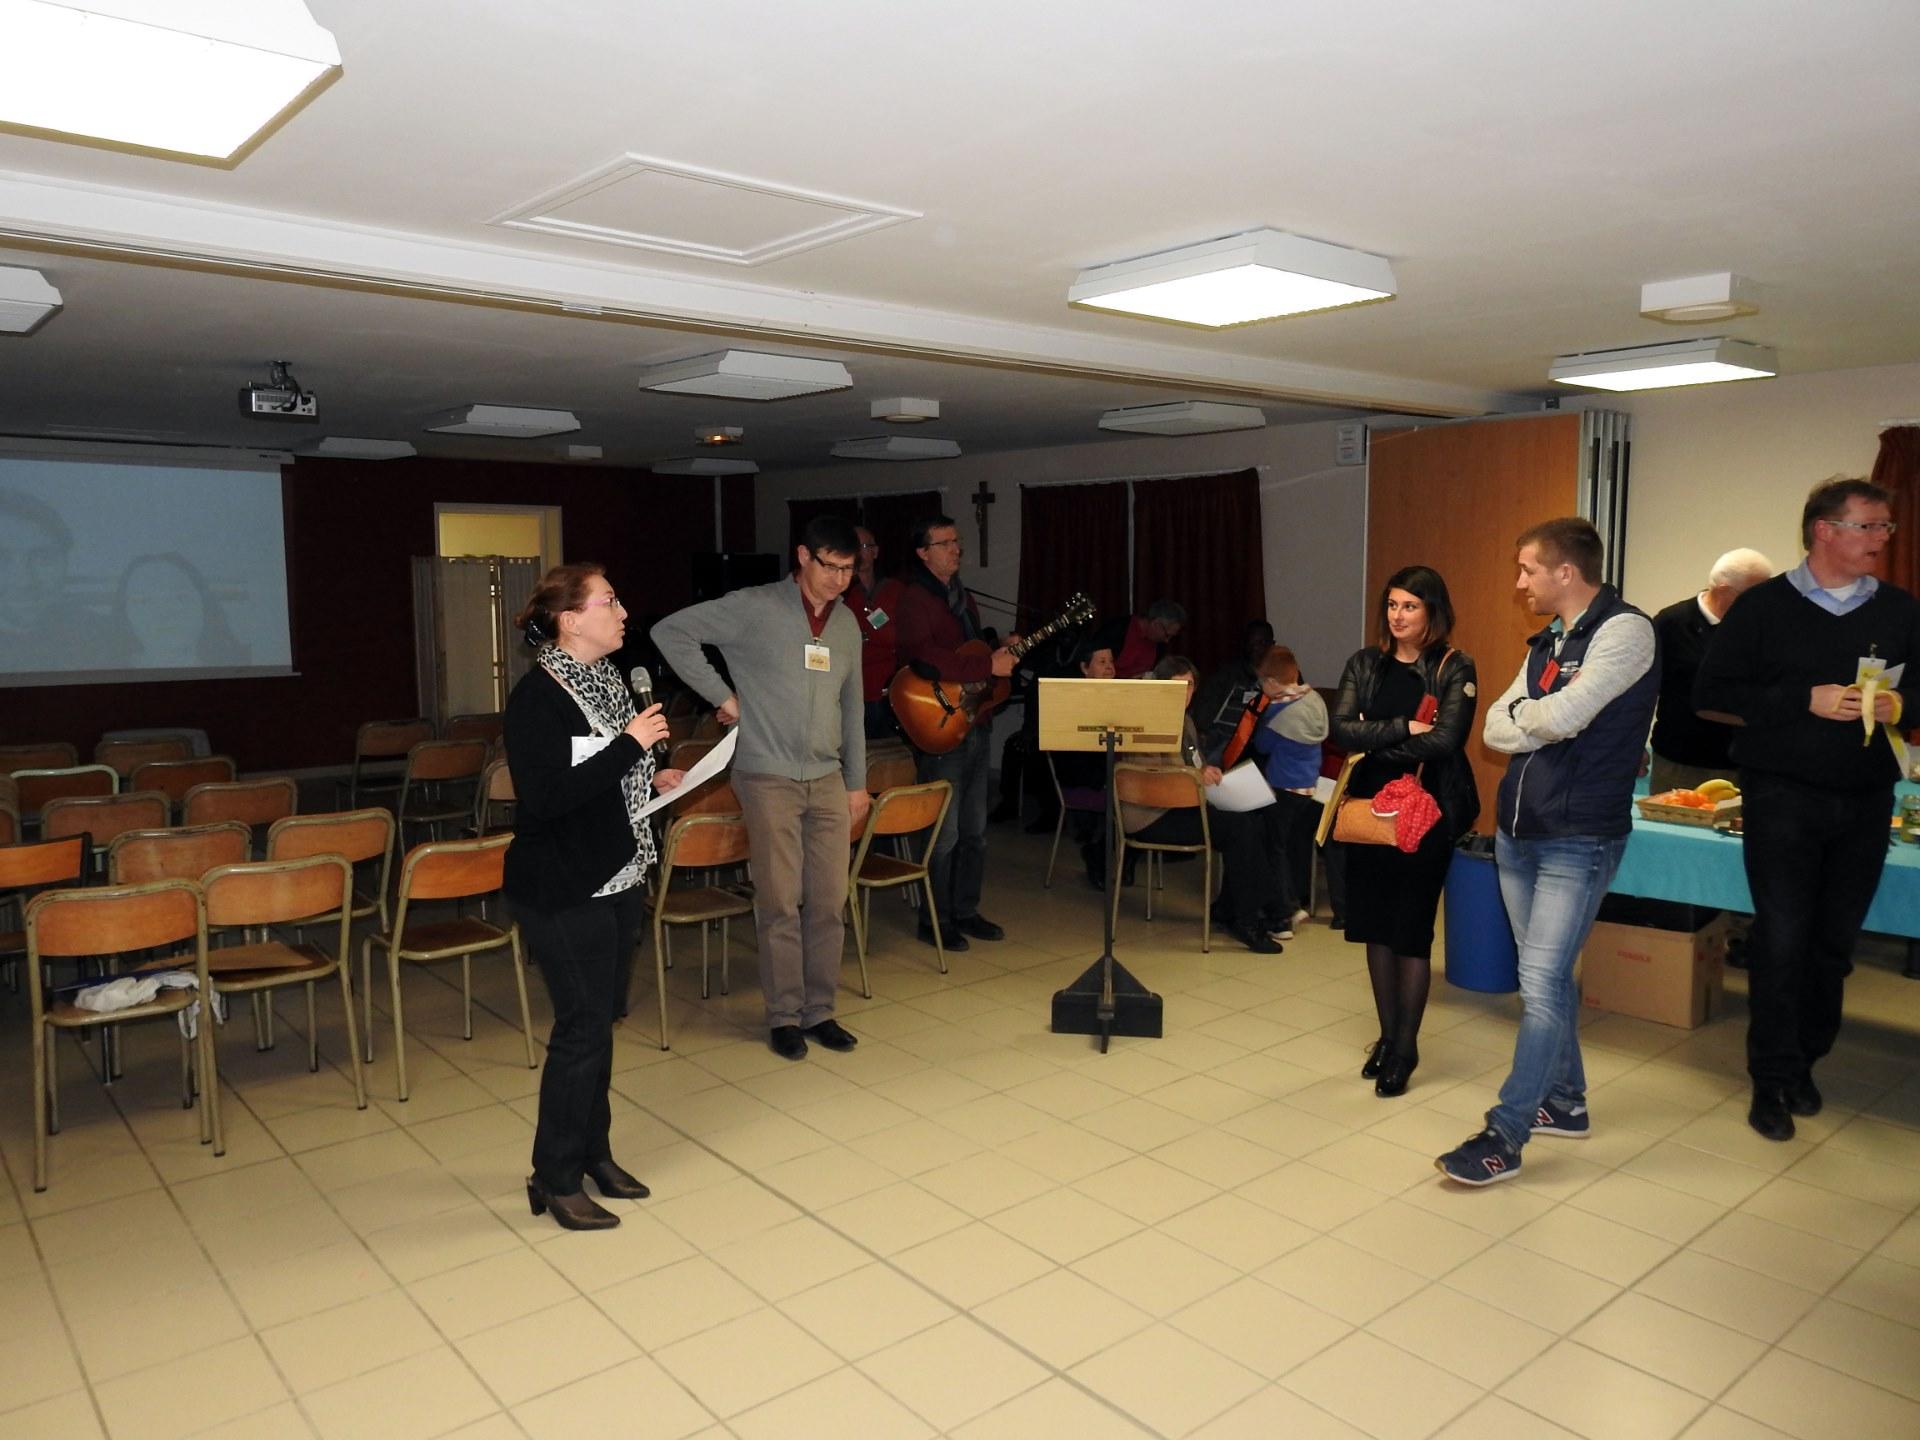 2018_03_16-12-Caudry (59)-Preparation au mariage